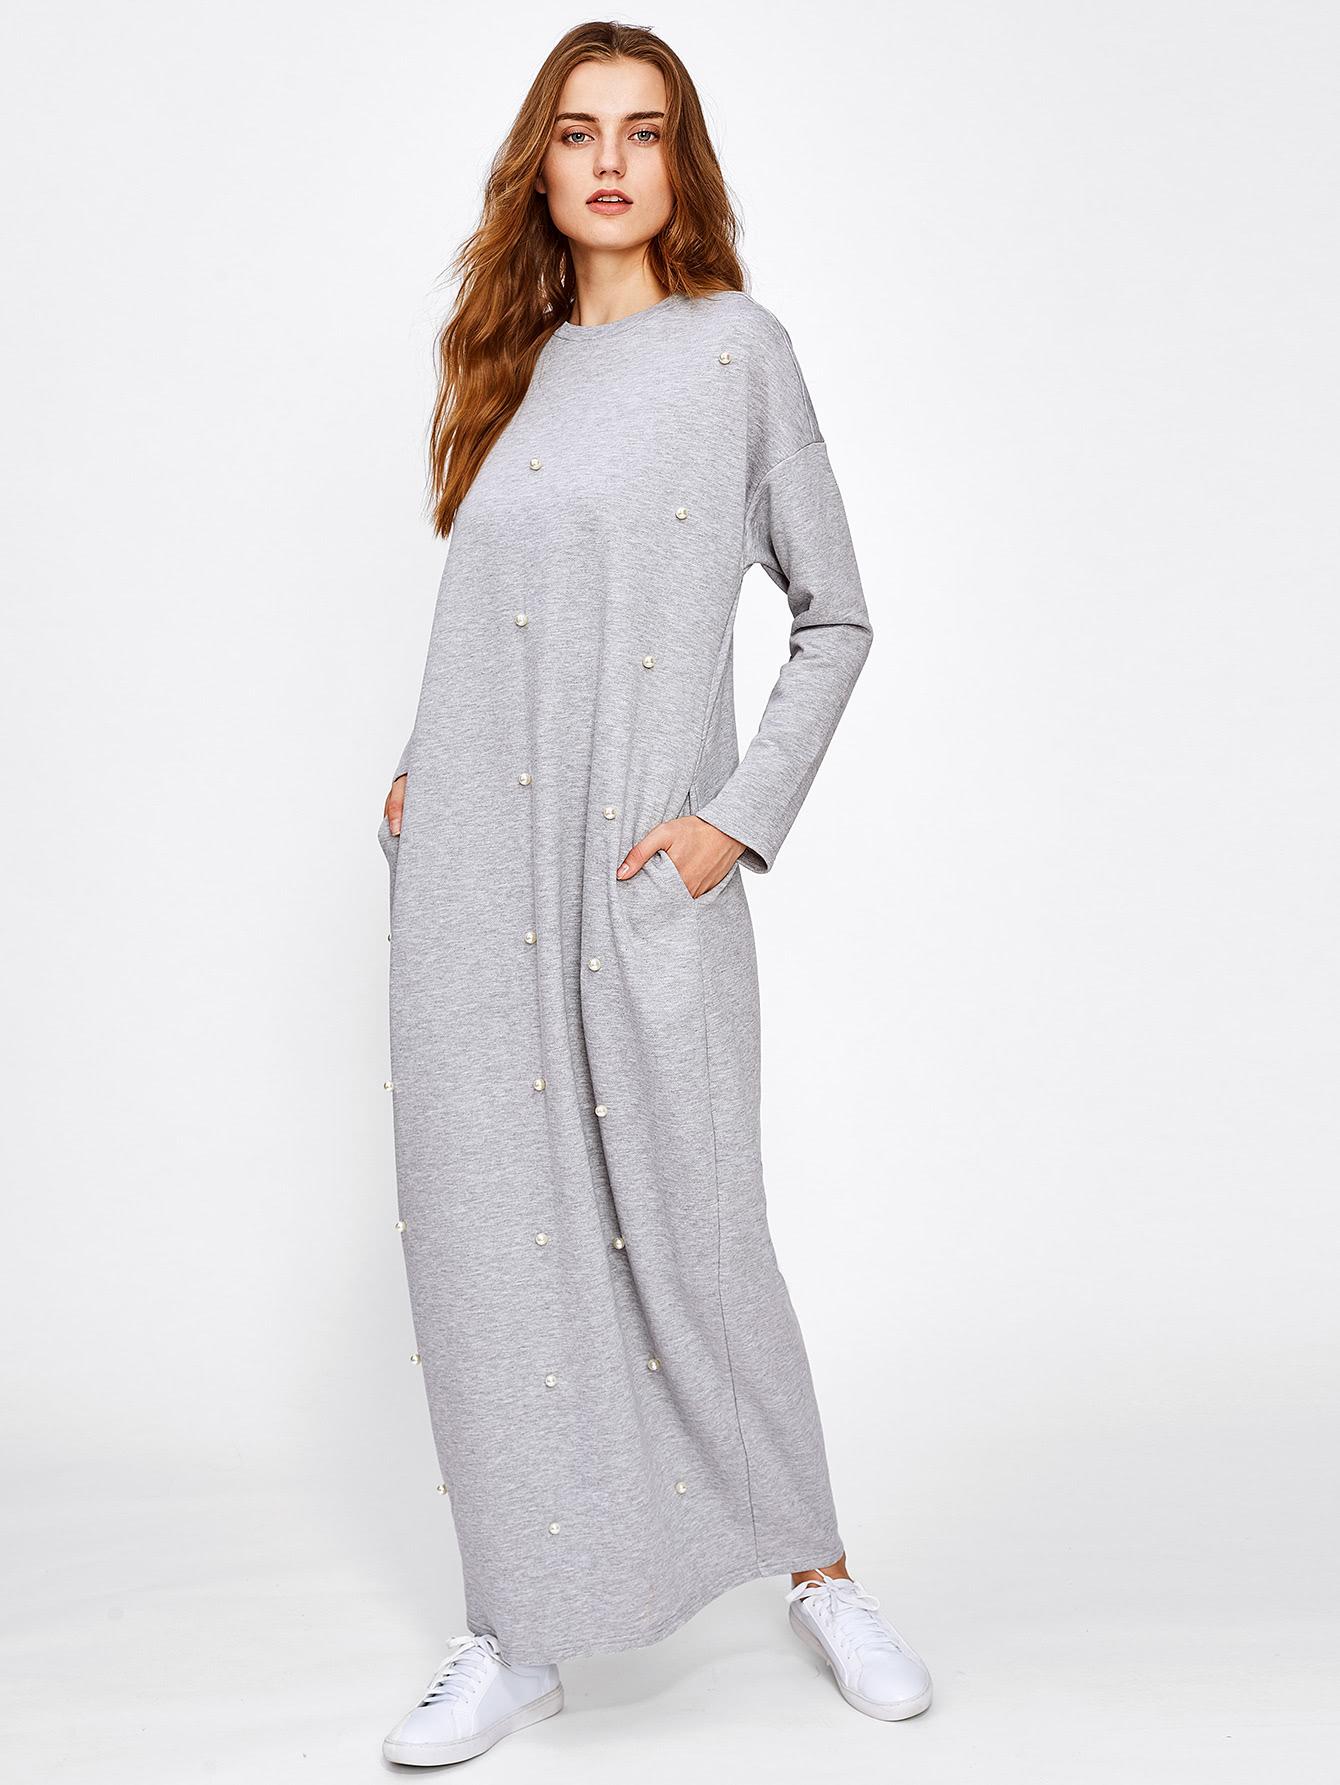 Pearl Beading Heather Knit Hijab Long Dress